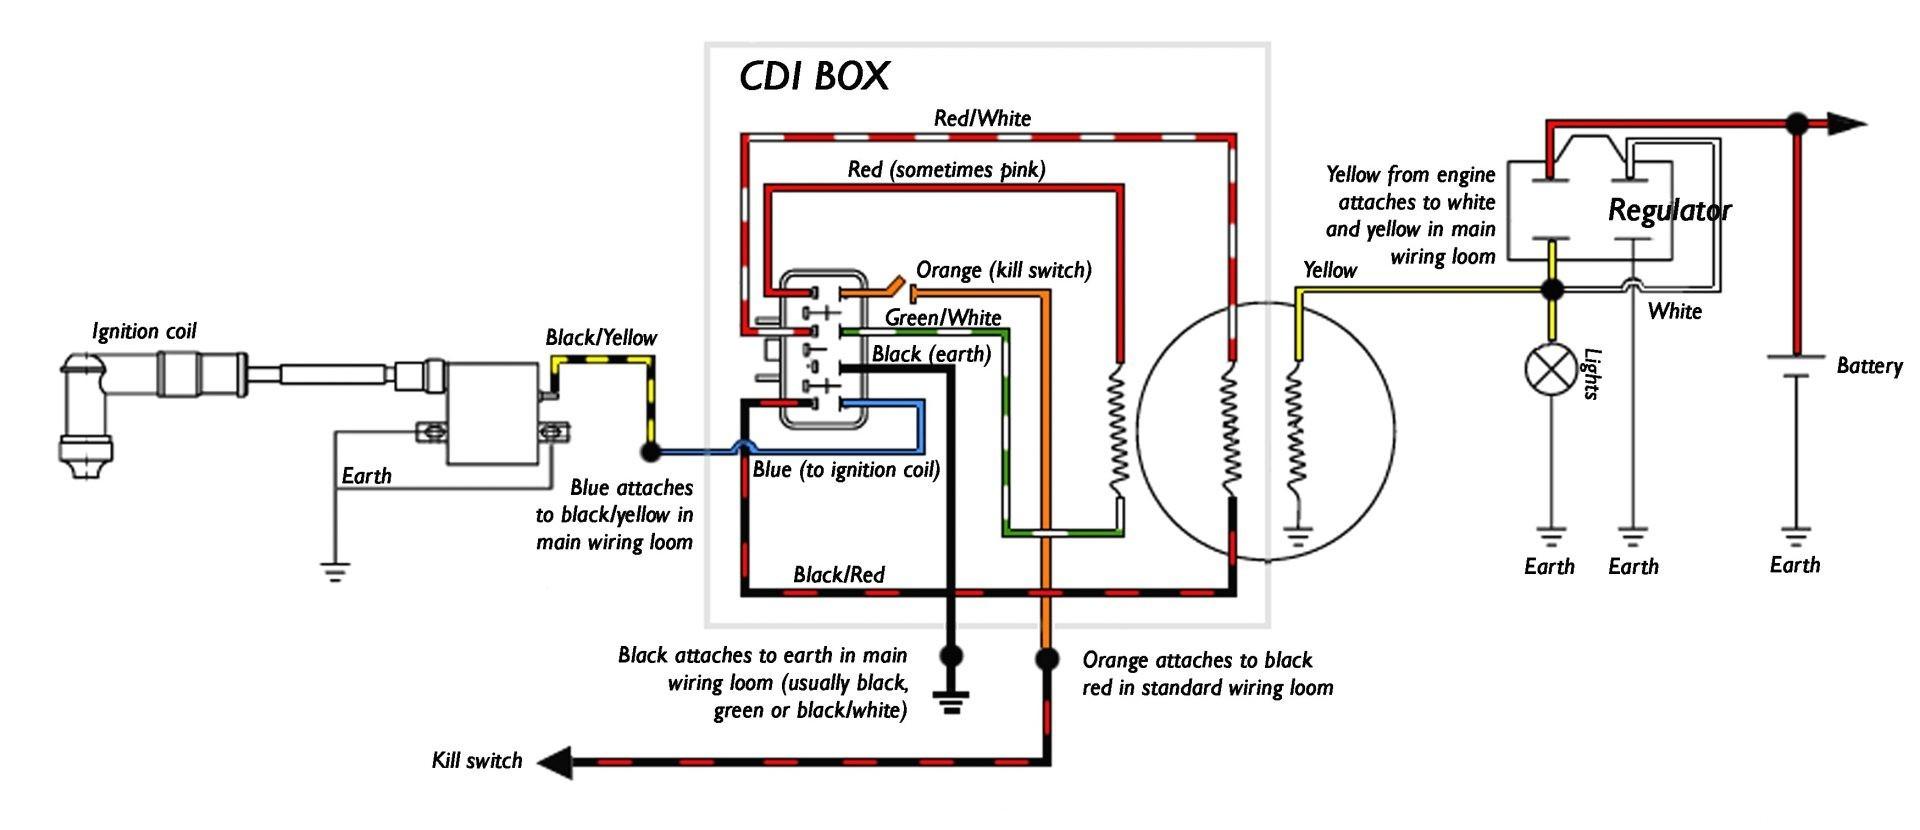 yamaha cdi wiring color rh 9637  wiring diagram together with cdi ignition wiring diagram  cdi ignition wiring diagram